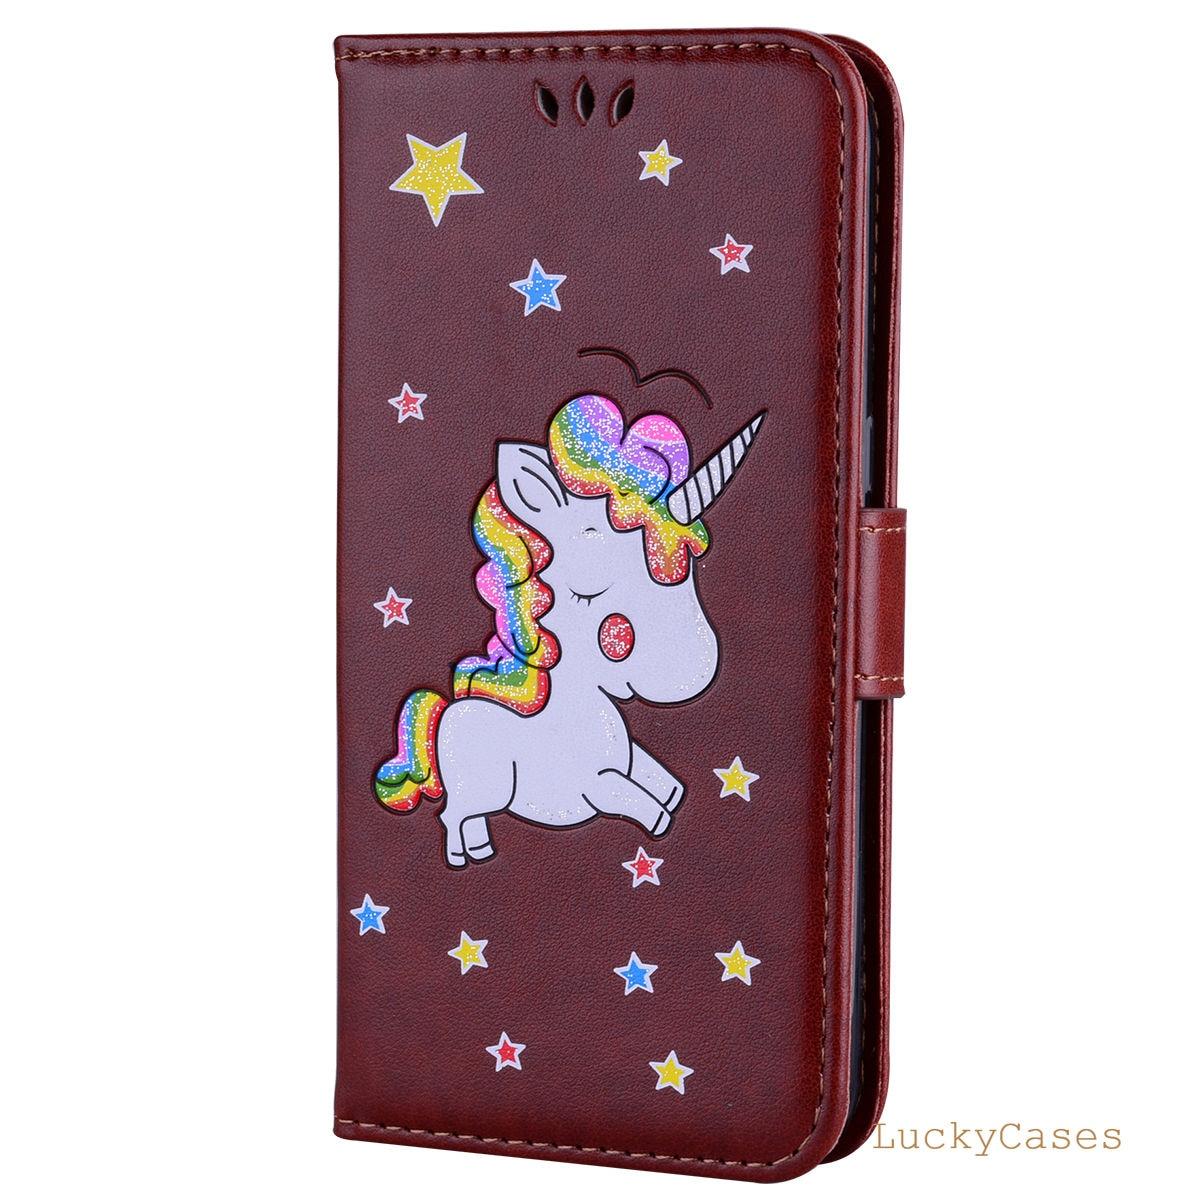 FGHGF for Samsung S7 EDGE phone Case Unicorn Flip Wallet Leather Cases for Samsung S7 EDGE Covers Luxury Capa